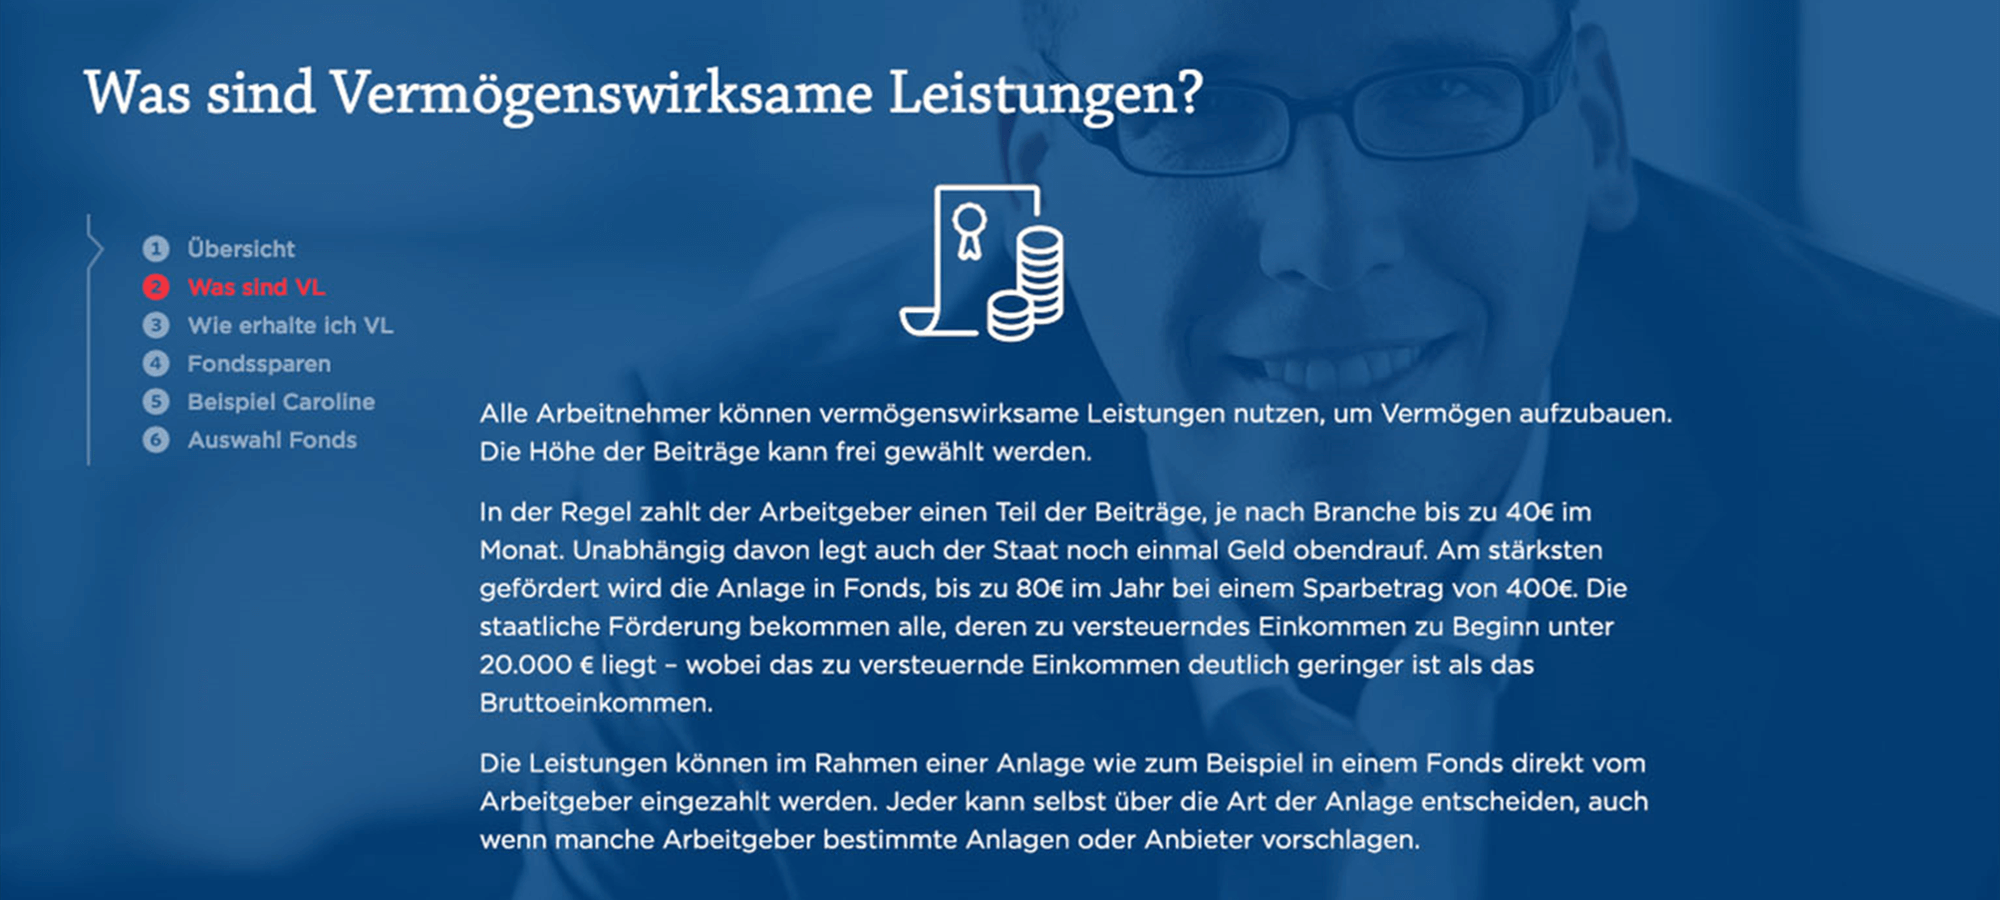 Ivestmentfonds ETF Sparpläne Vertrieb